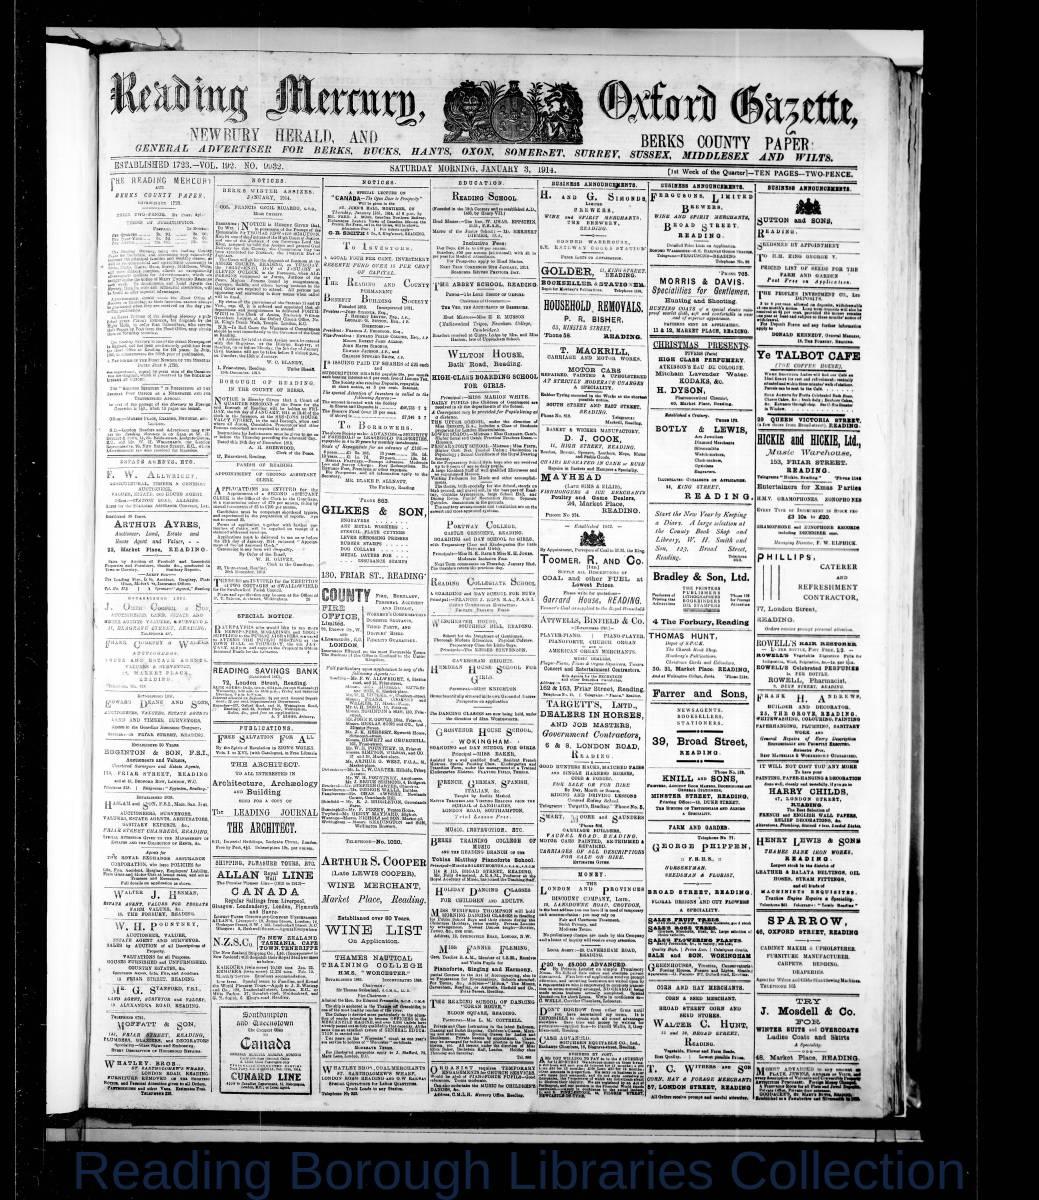 Reading Mercury Oxford Gazette, Saturday, January 3, 1914. Pg1